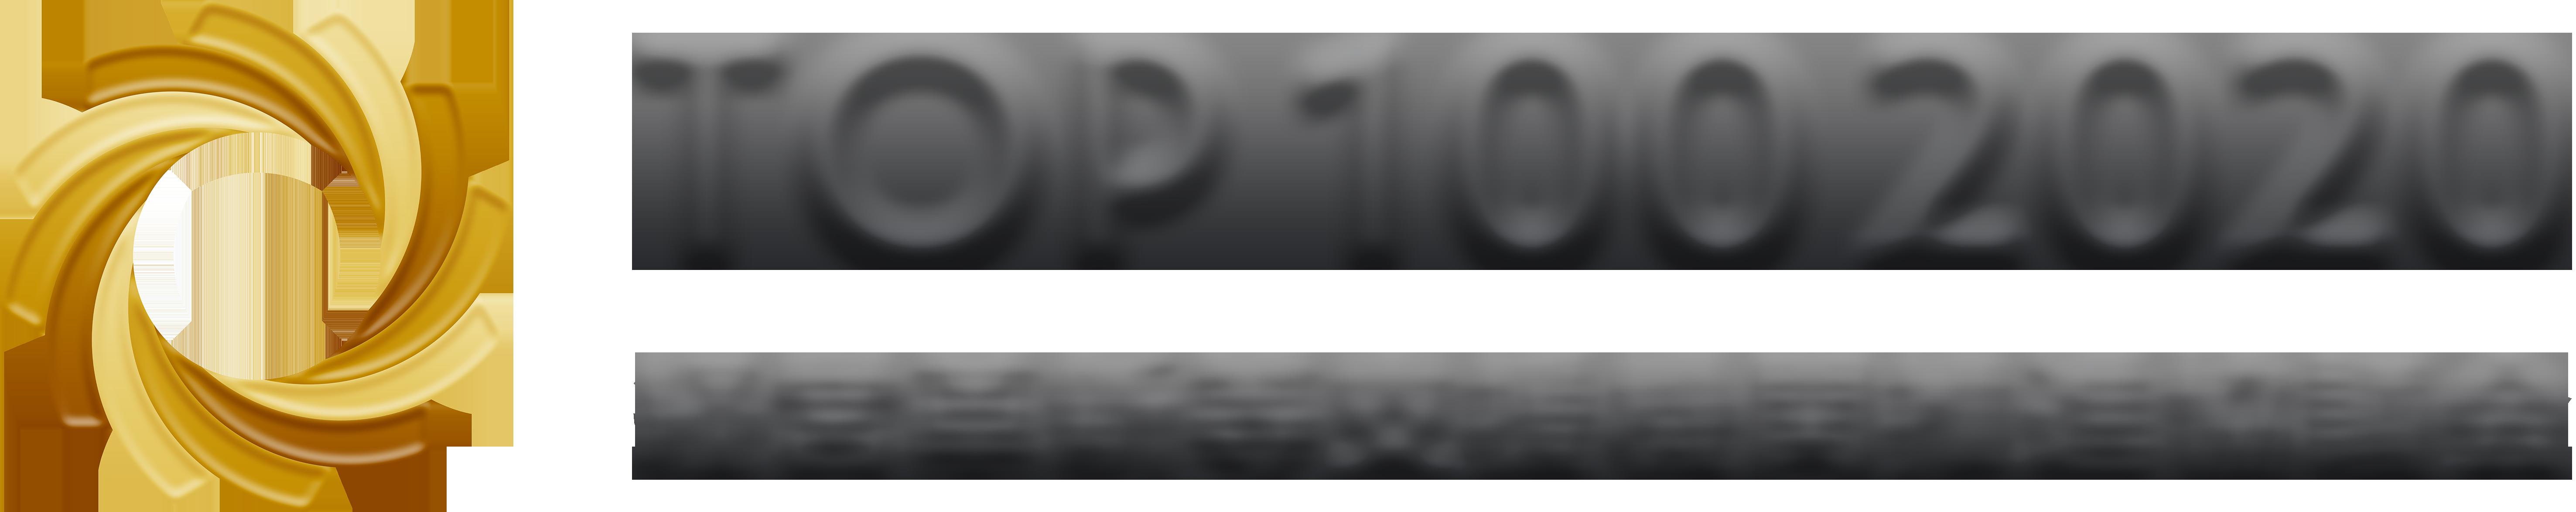 TOP100_2020_ヨコ_.png